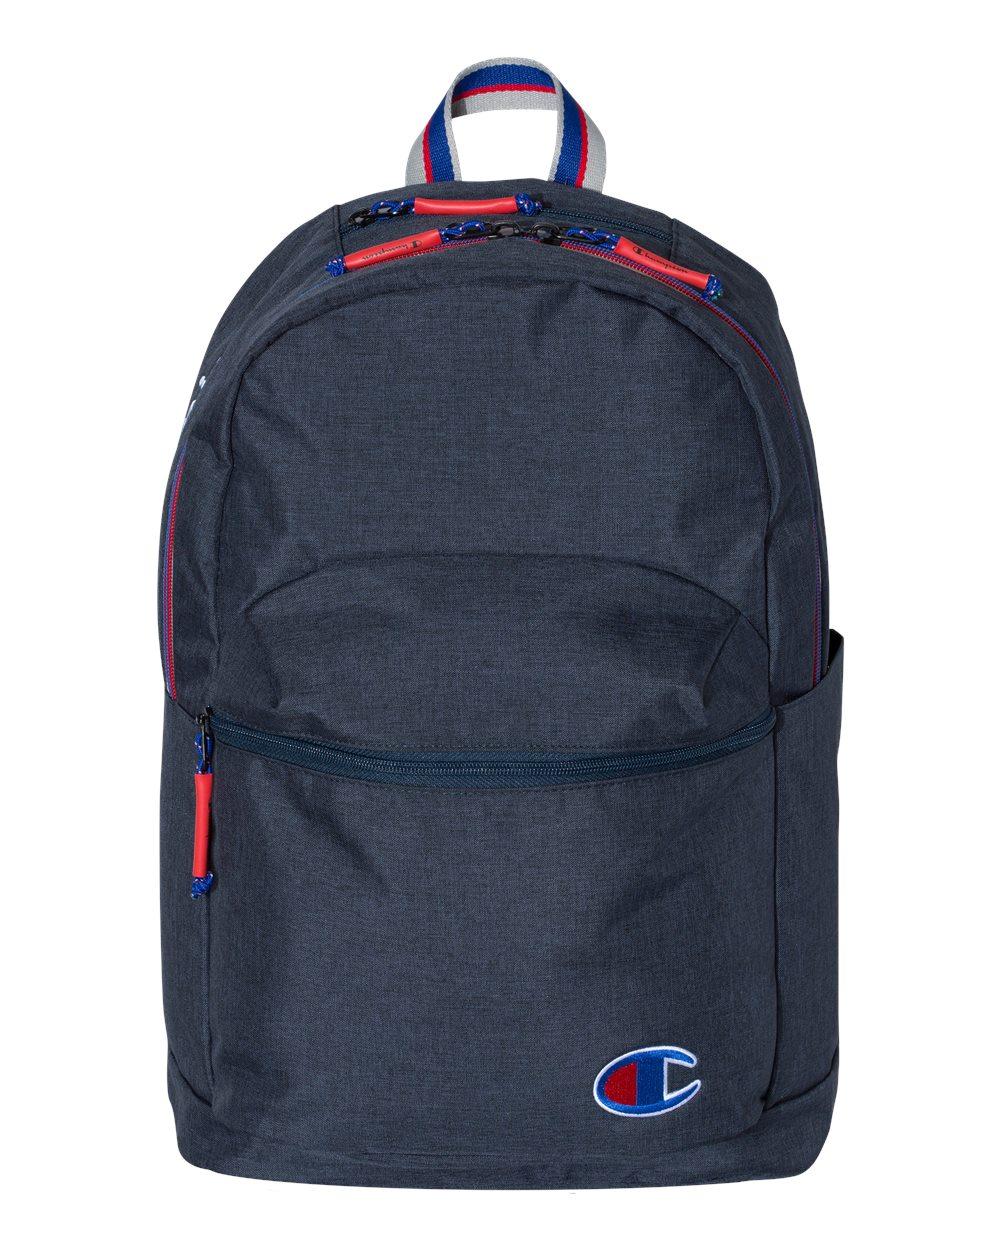 11-1//2 x 18  x 6-1//4 Champion 21L Script Backpack School Bag Books CS1000